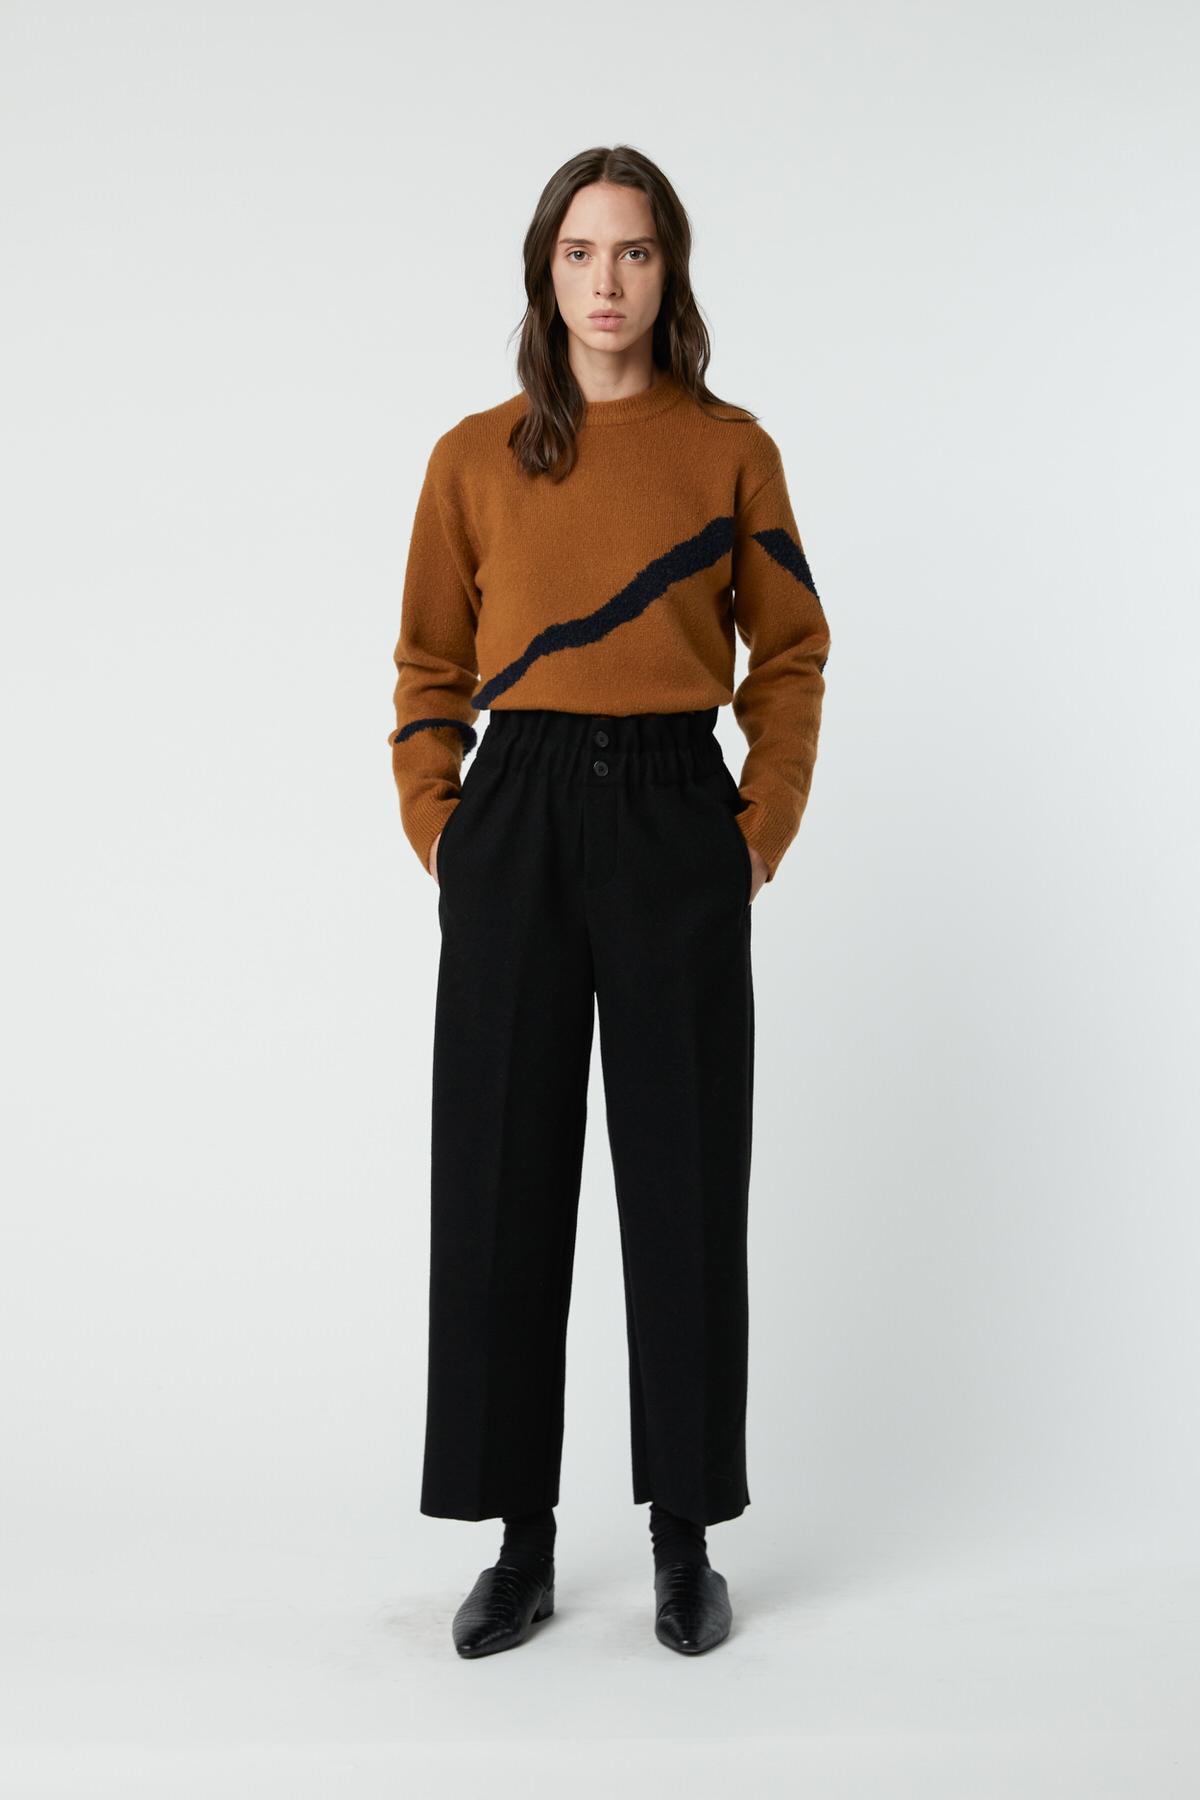 Sweater 2710 Mustard 9